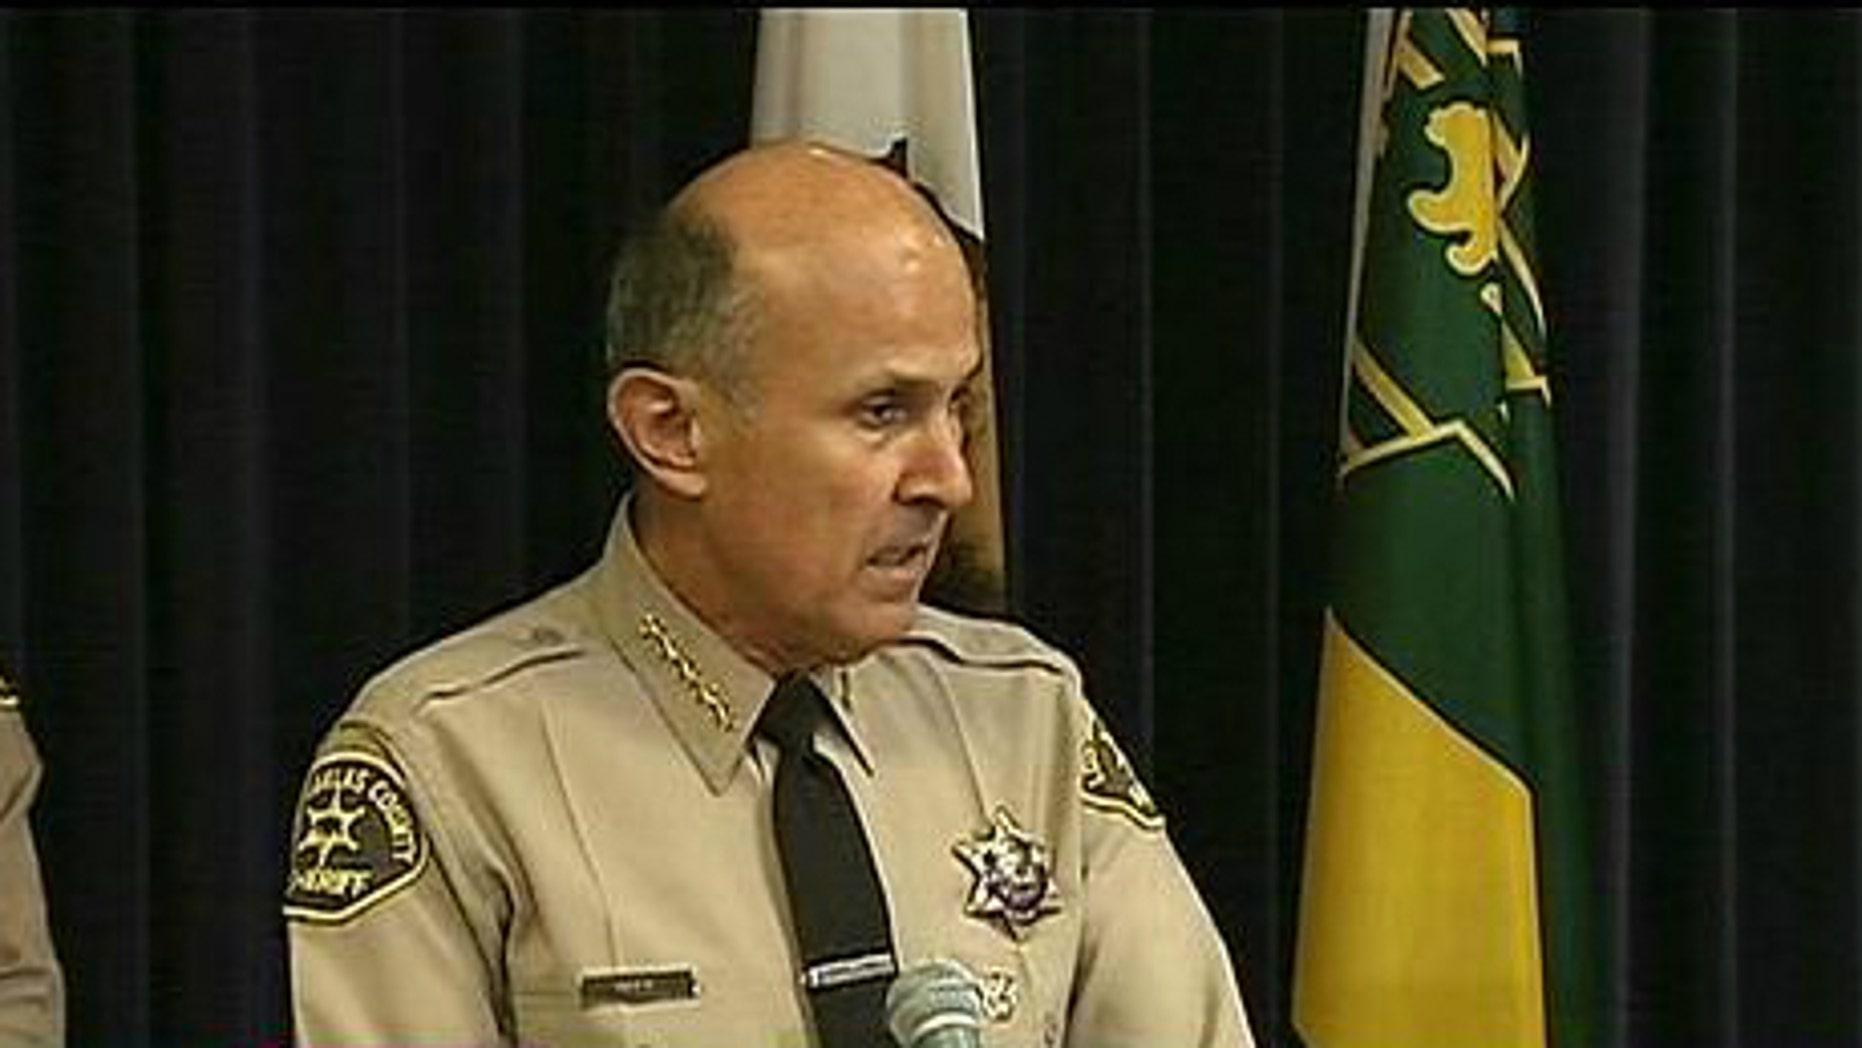 Los Angeles County Sheriff Lee Baca (MyFoxLA.com)